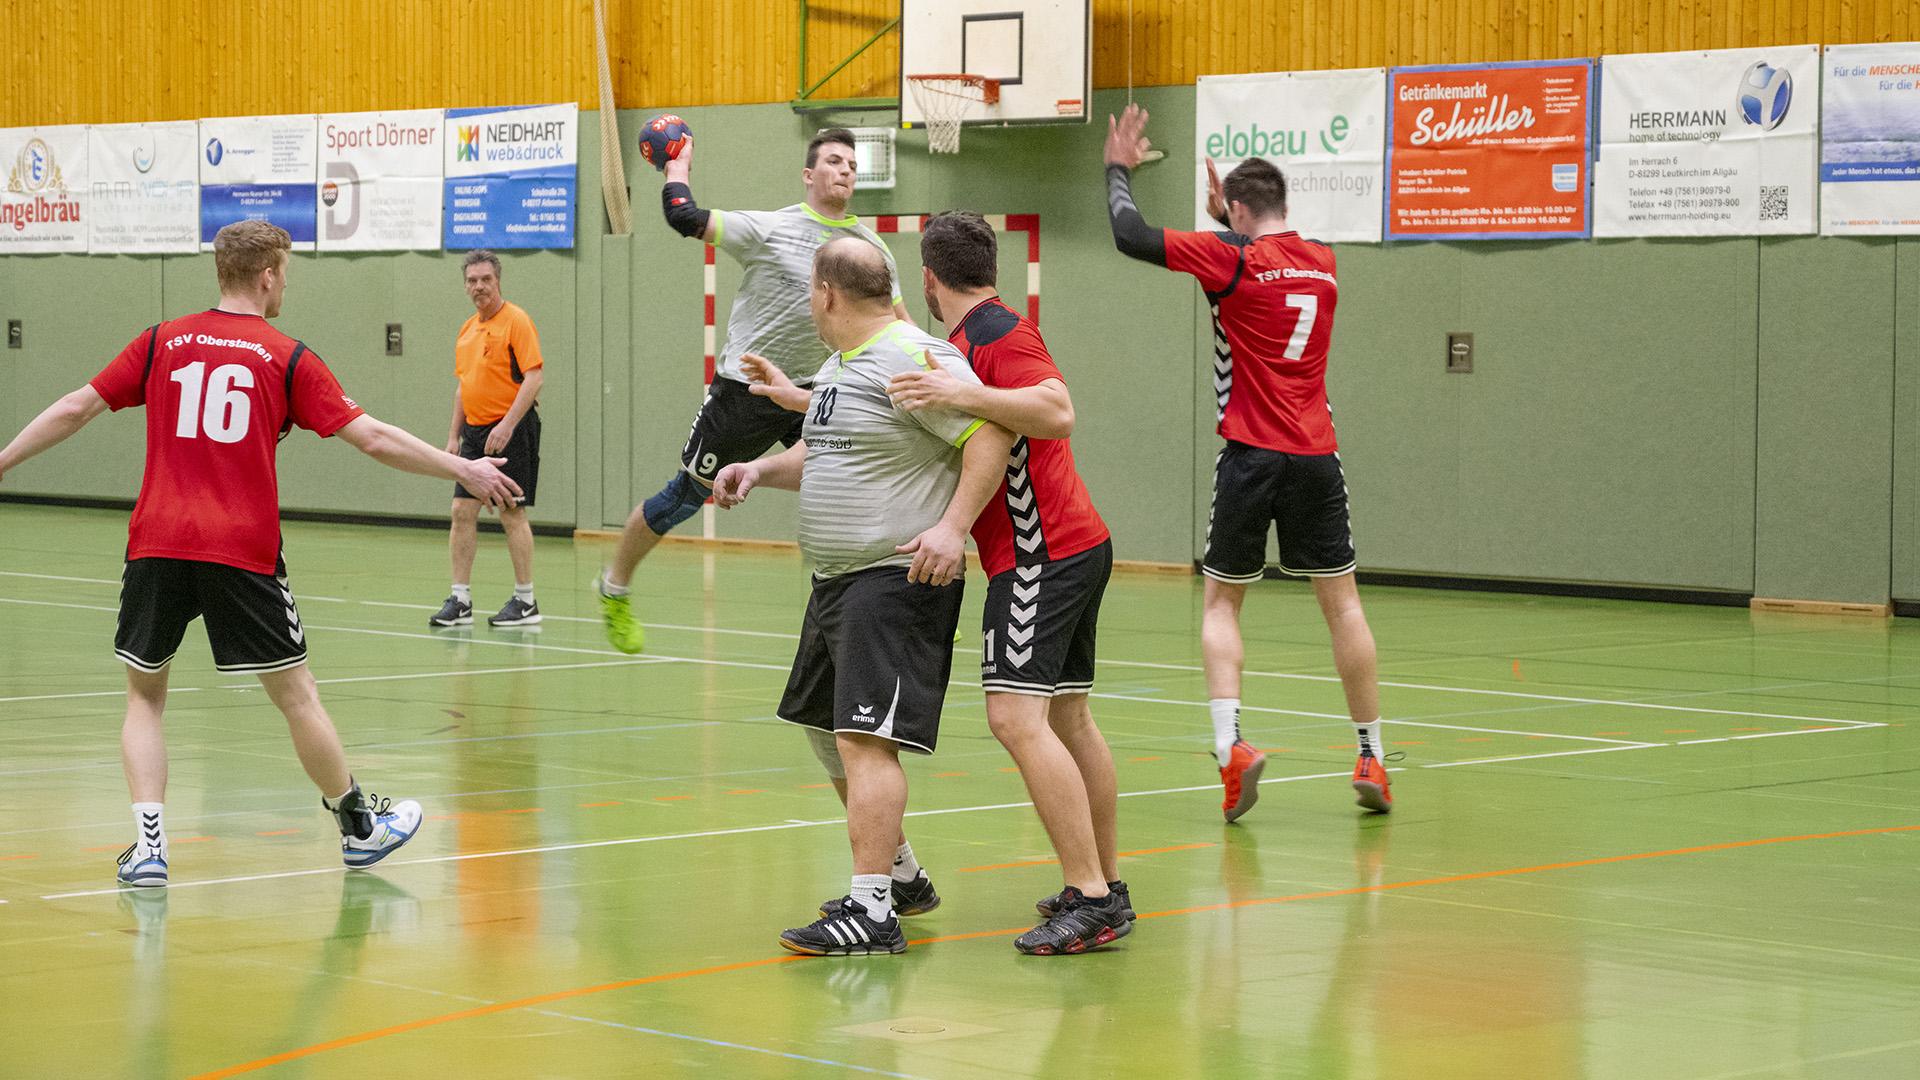 060Slider_Herren2_tsg_leutkirch_handball